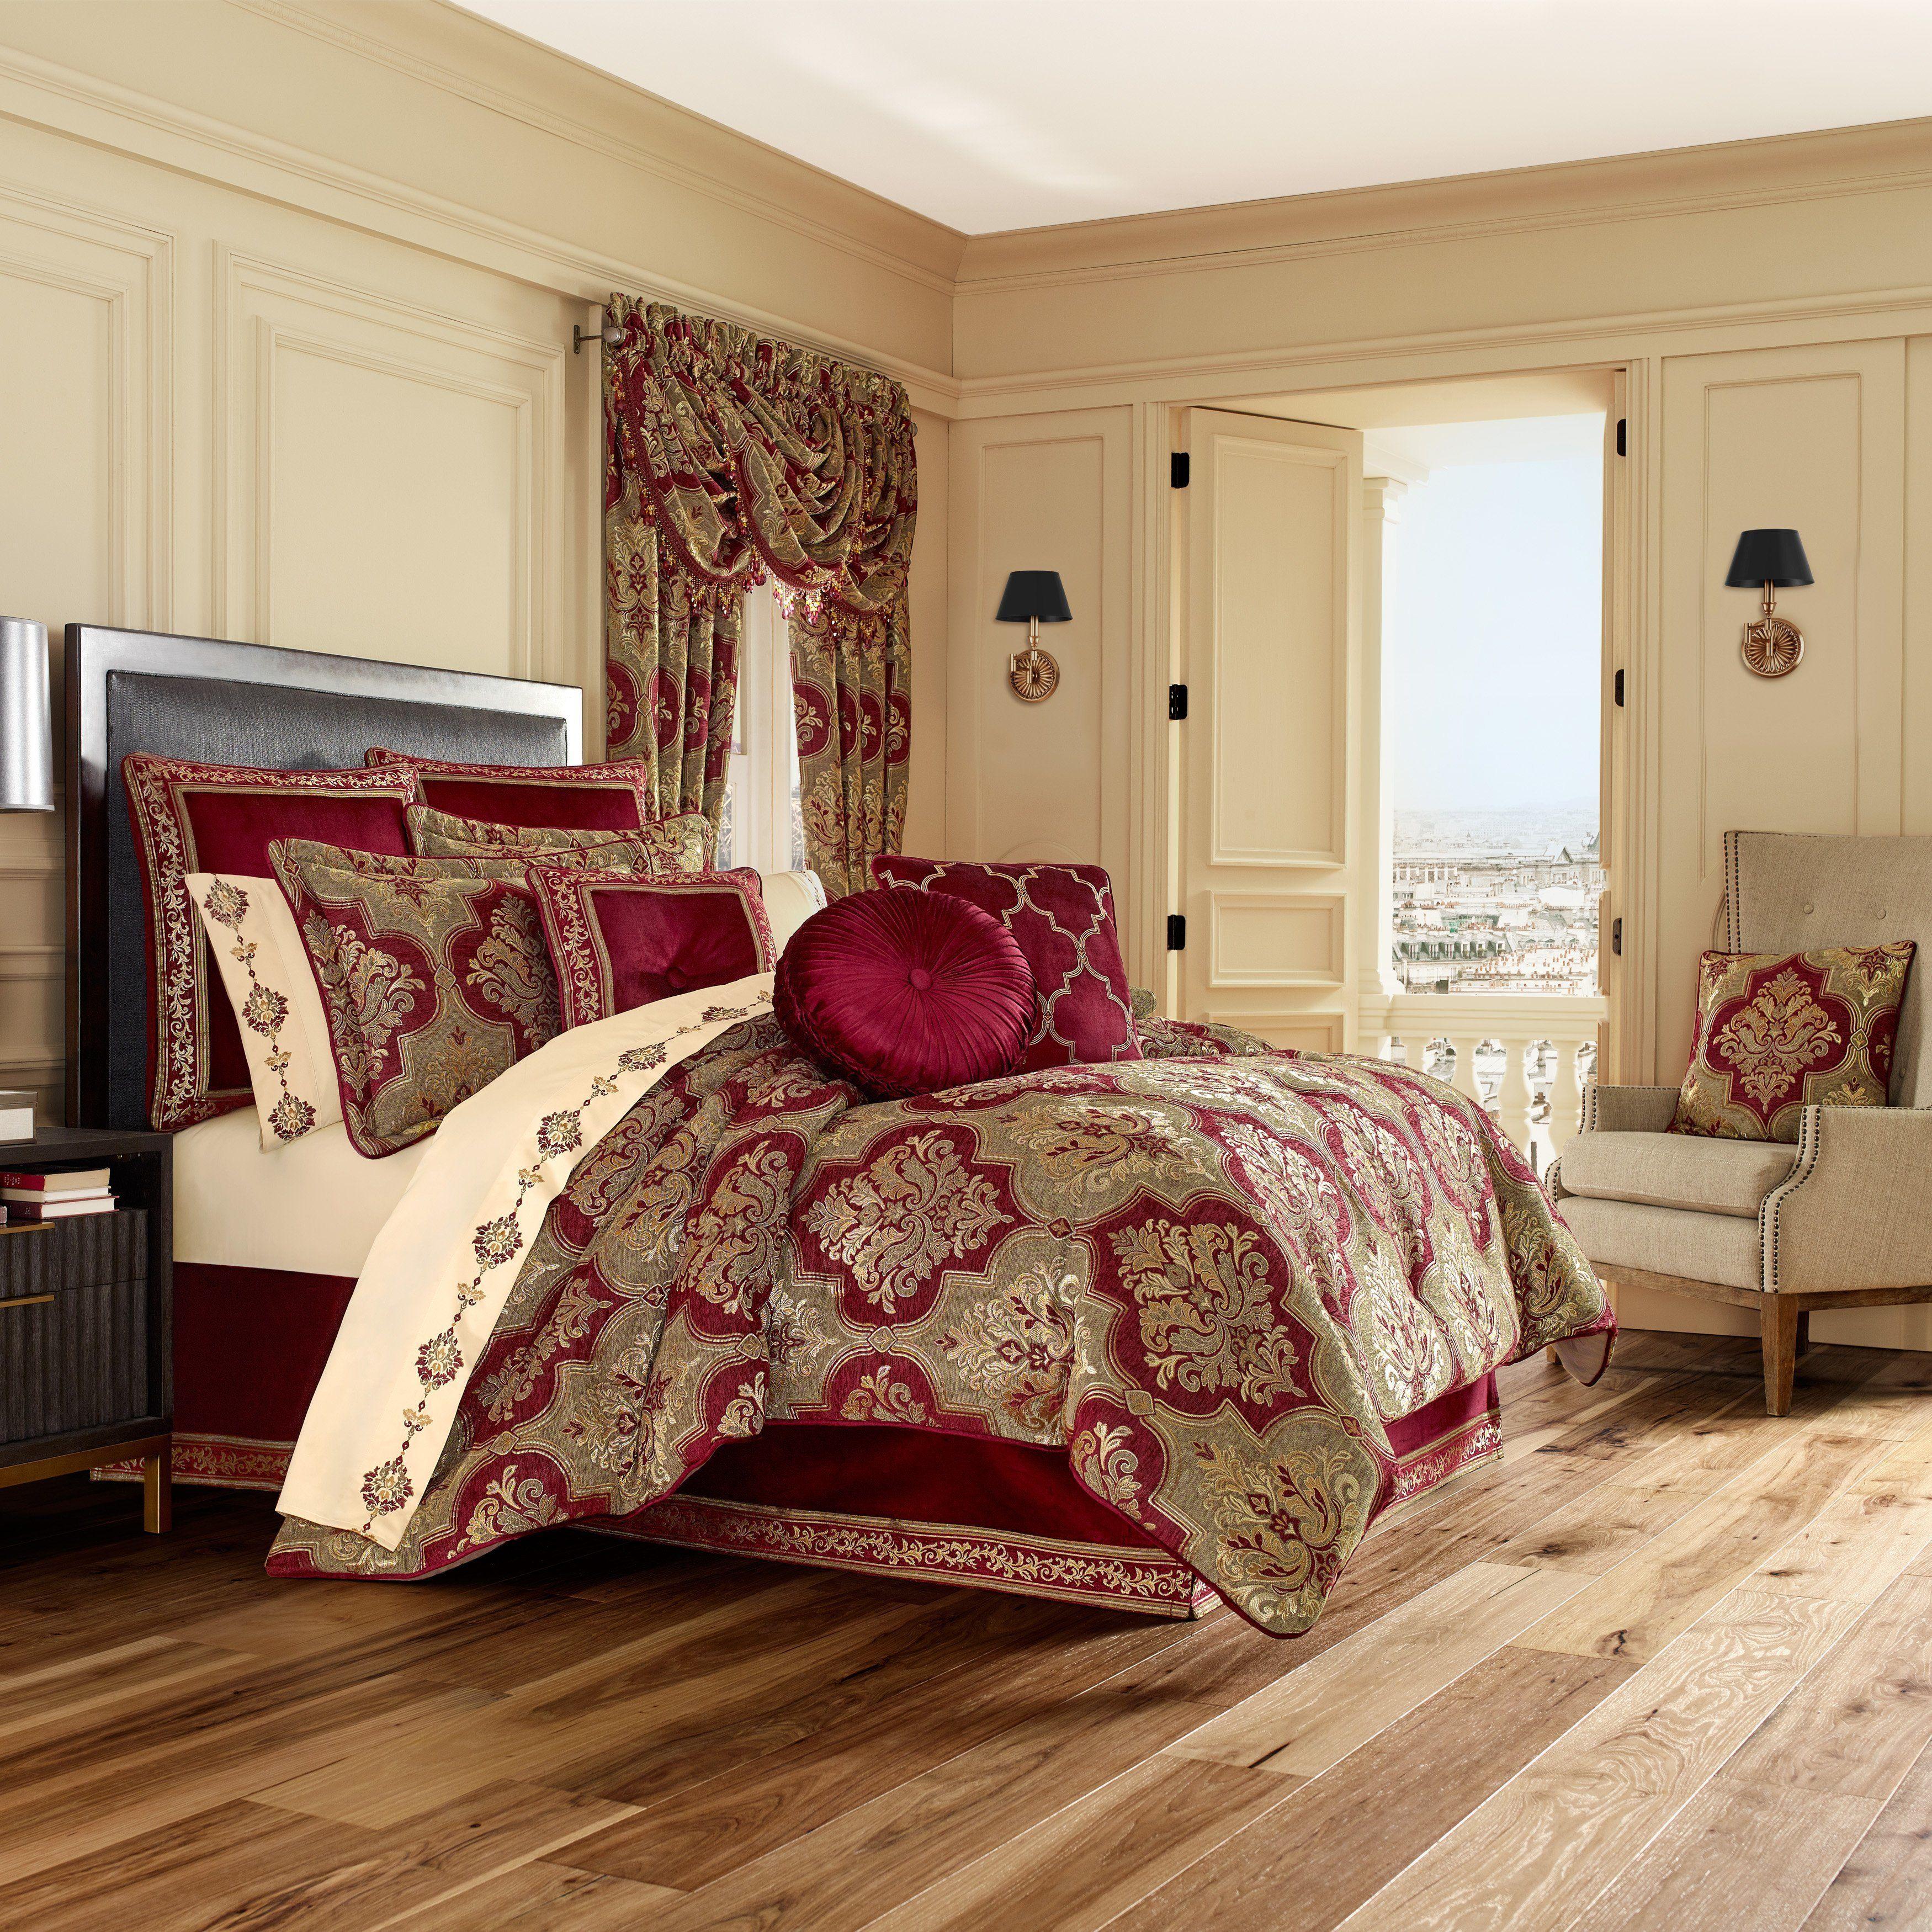 Maribella Crimson 4Piece Comforter Set in 2020